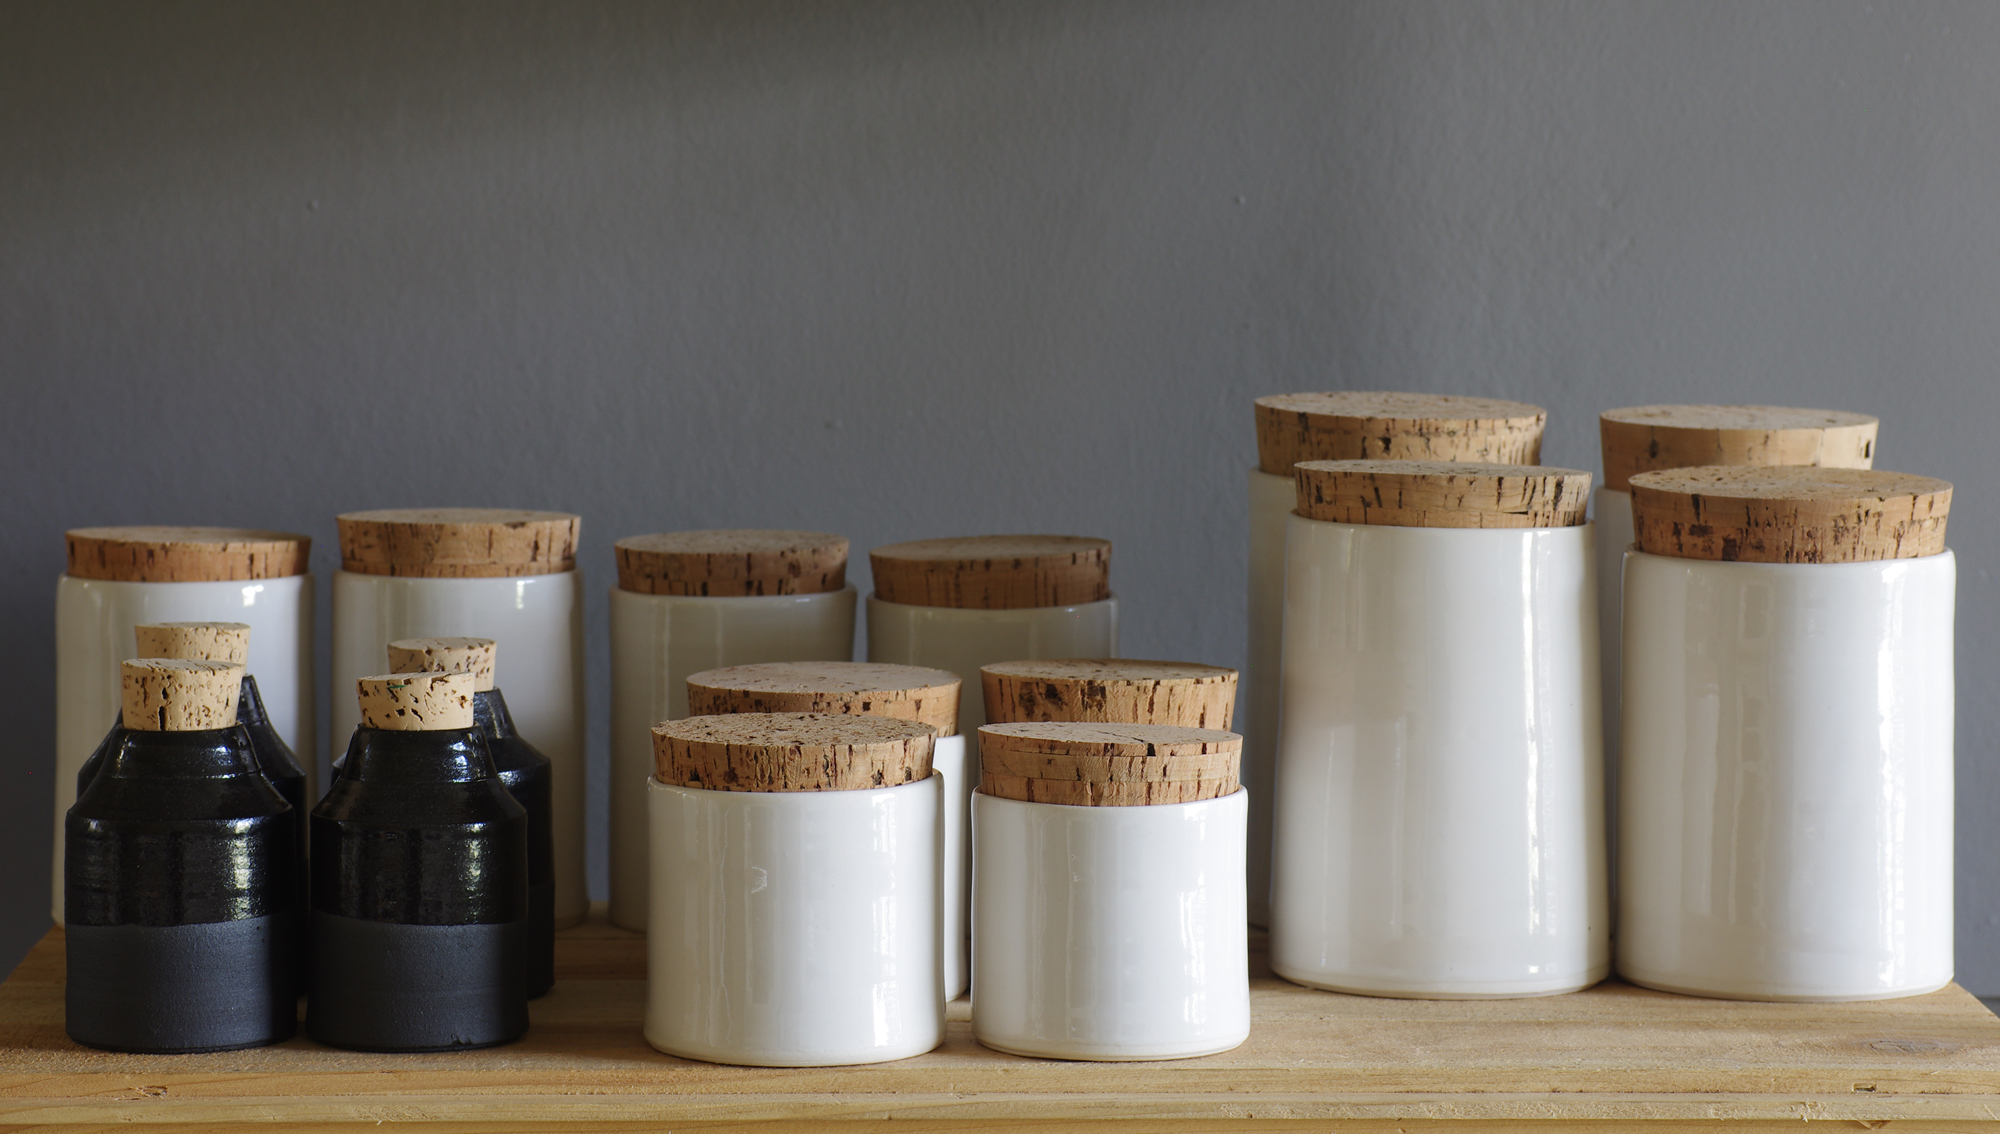 vitrifiedstudio wholesale order